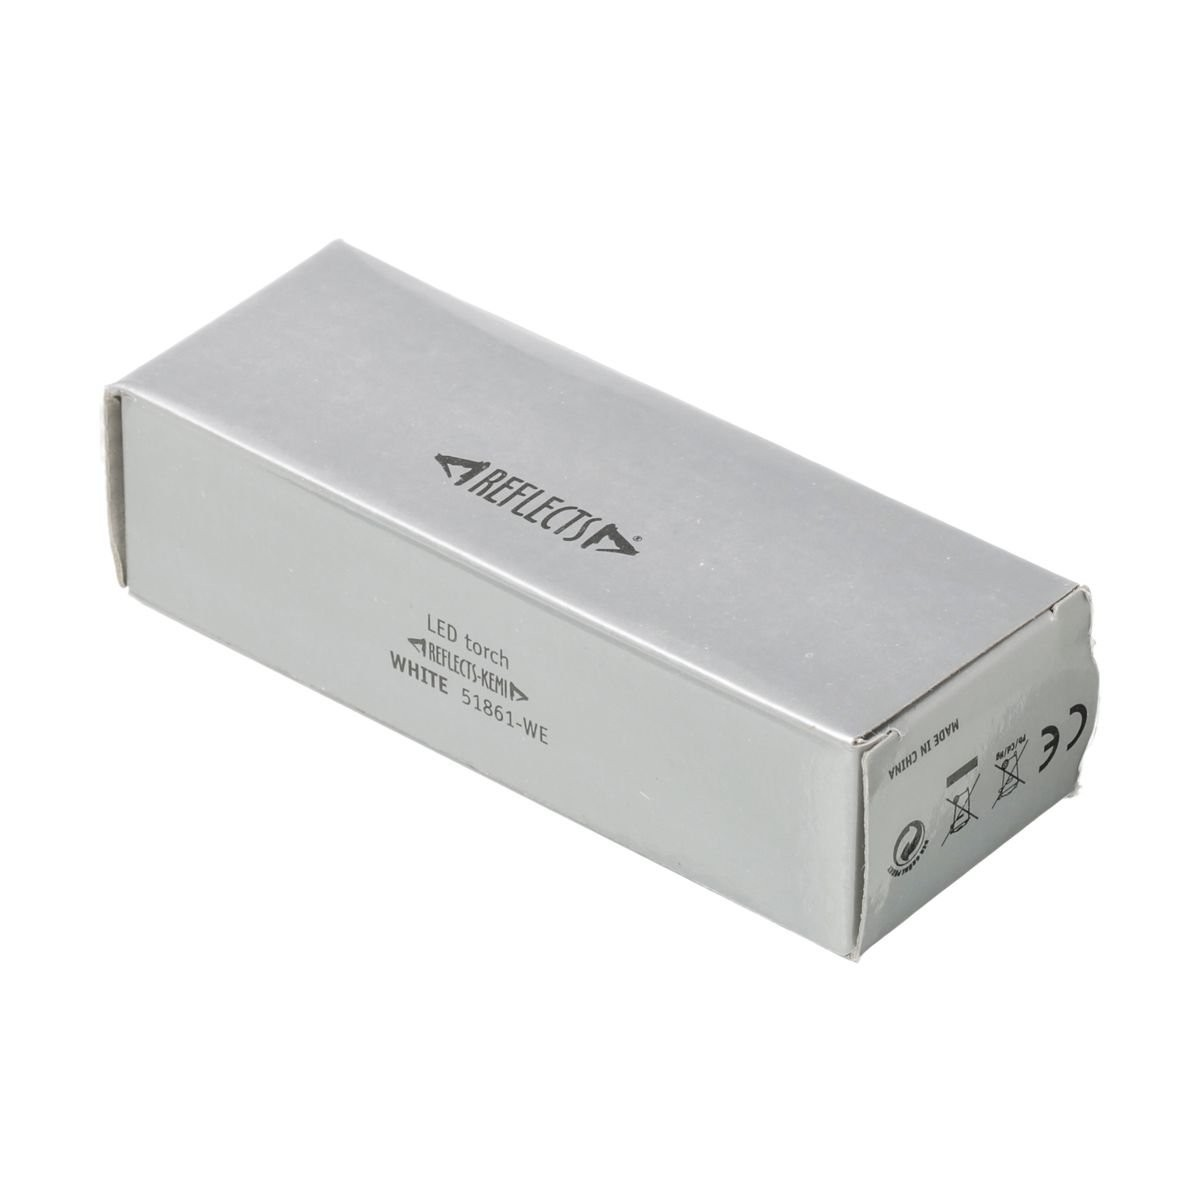 LED Taschenlampe REFLECTS-KEMI WHITE, Ansicht 5